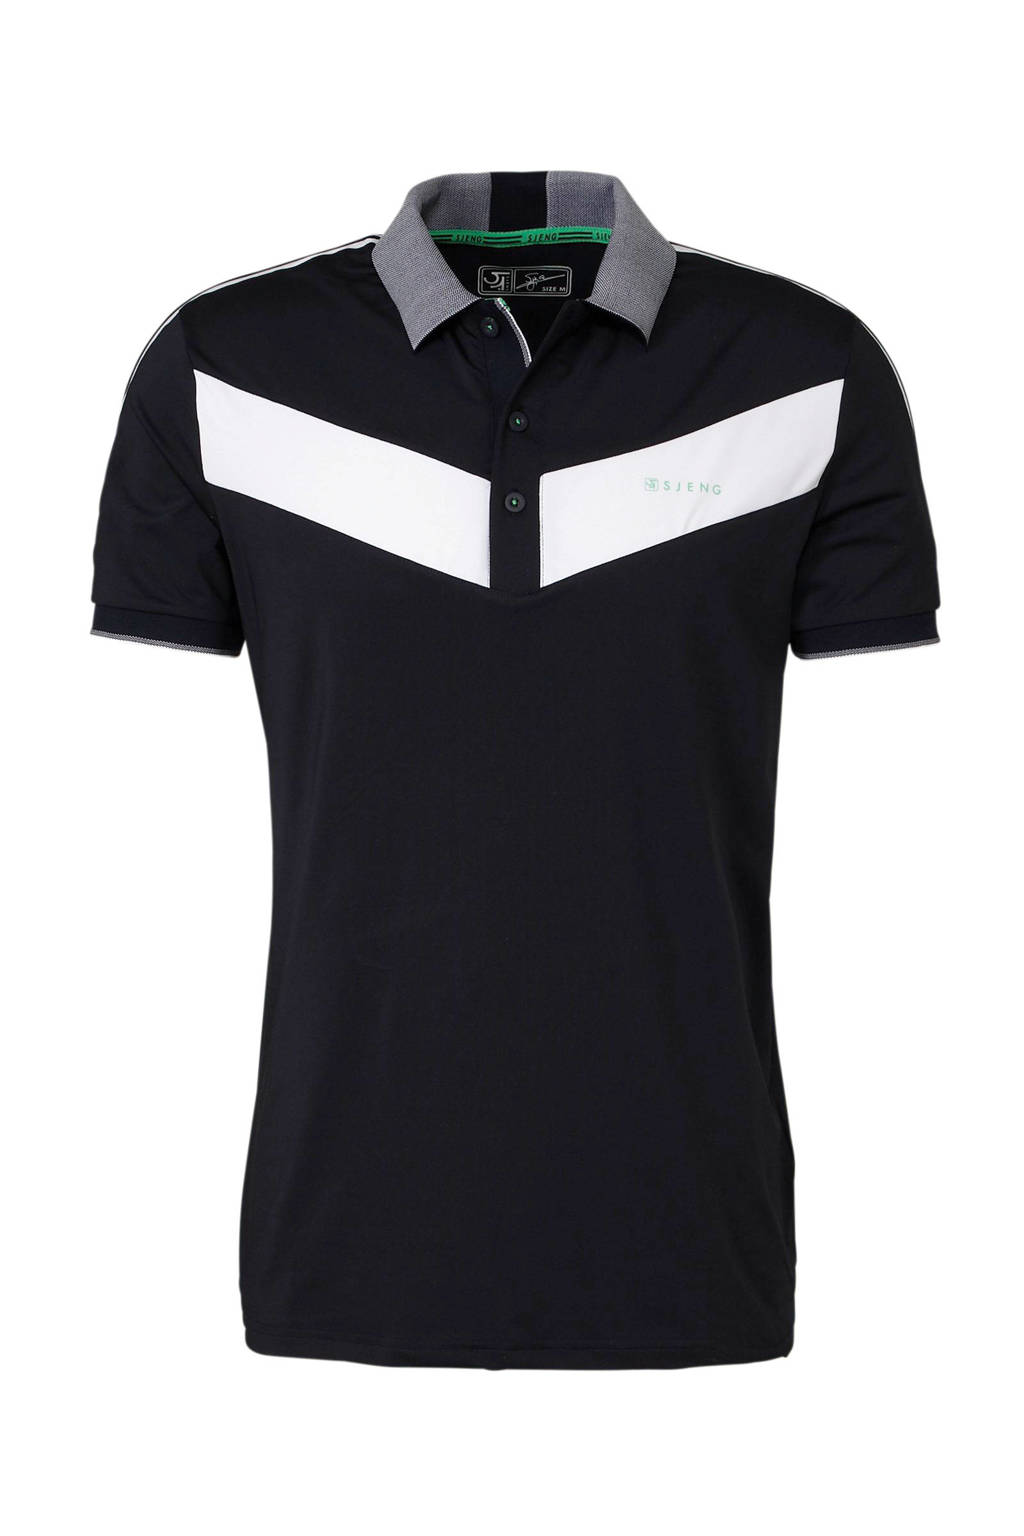 Sjeng Sports   polo donkerblauw, Donkerblauw/wit